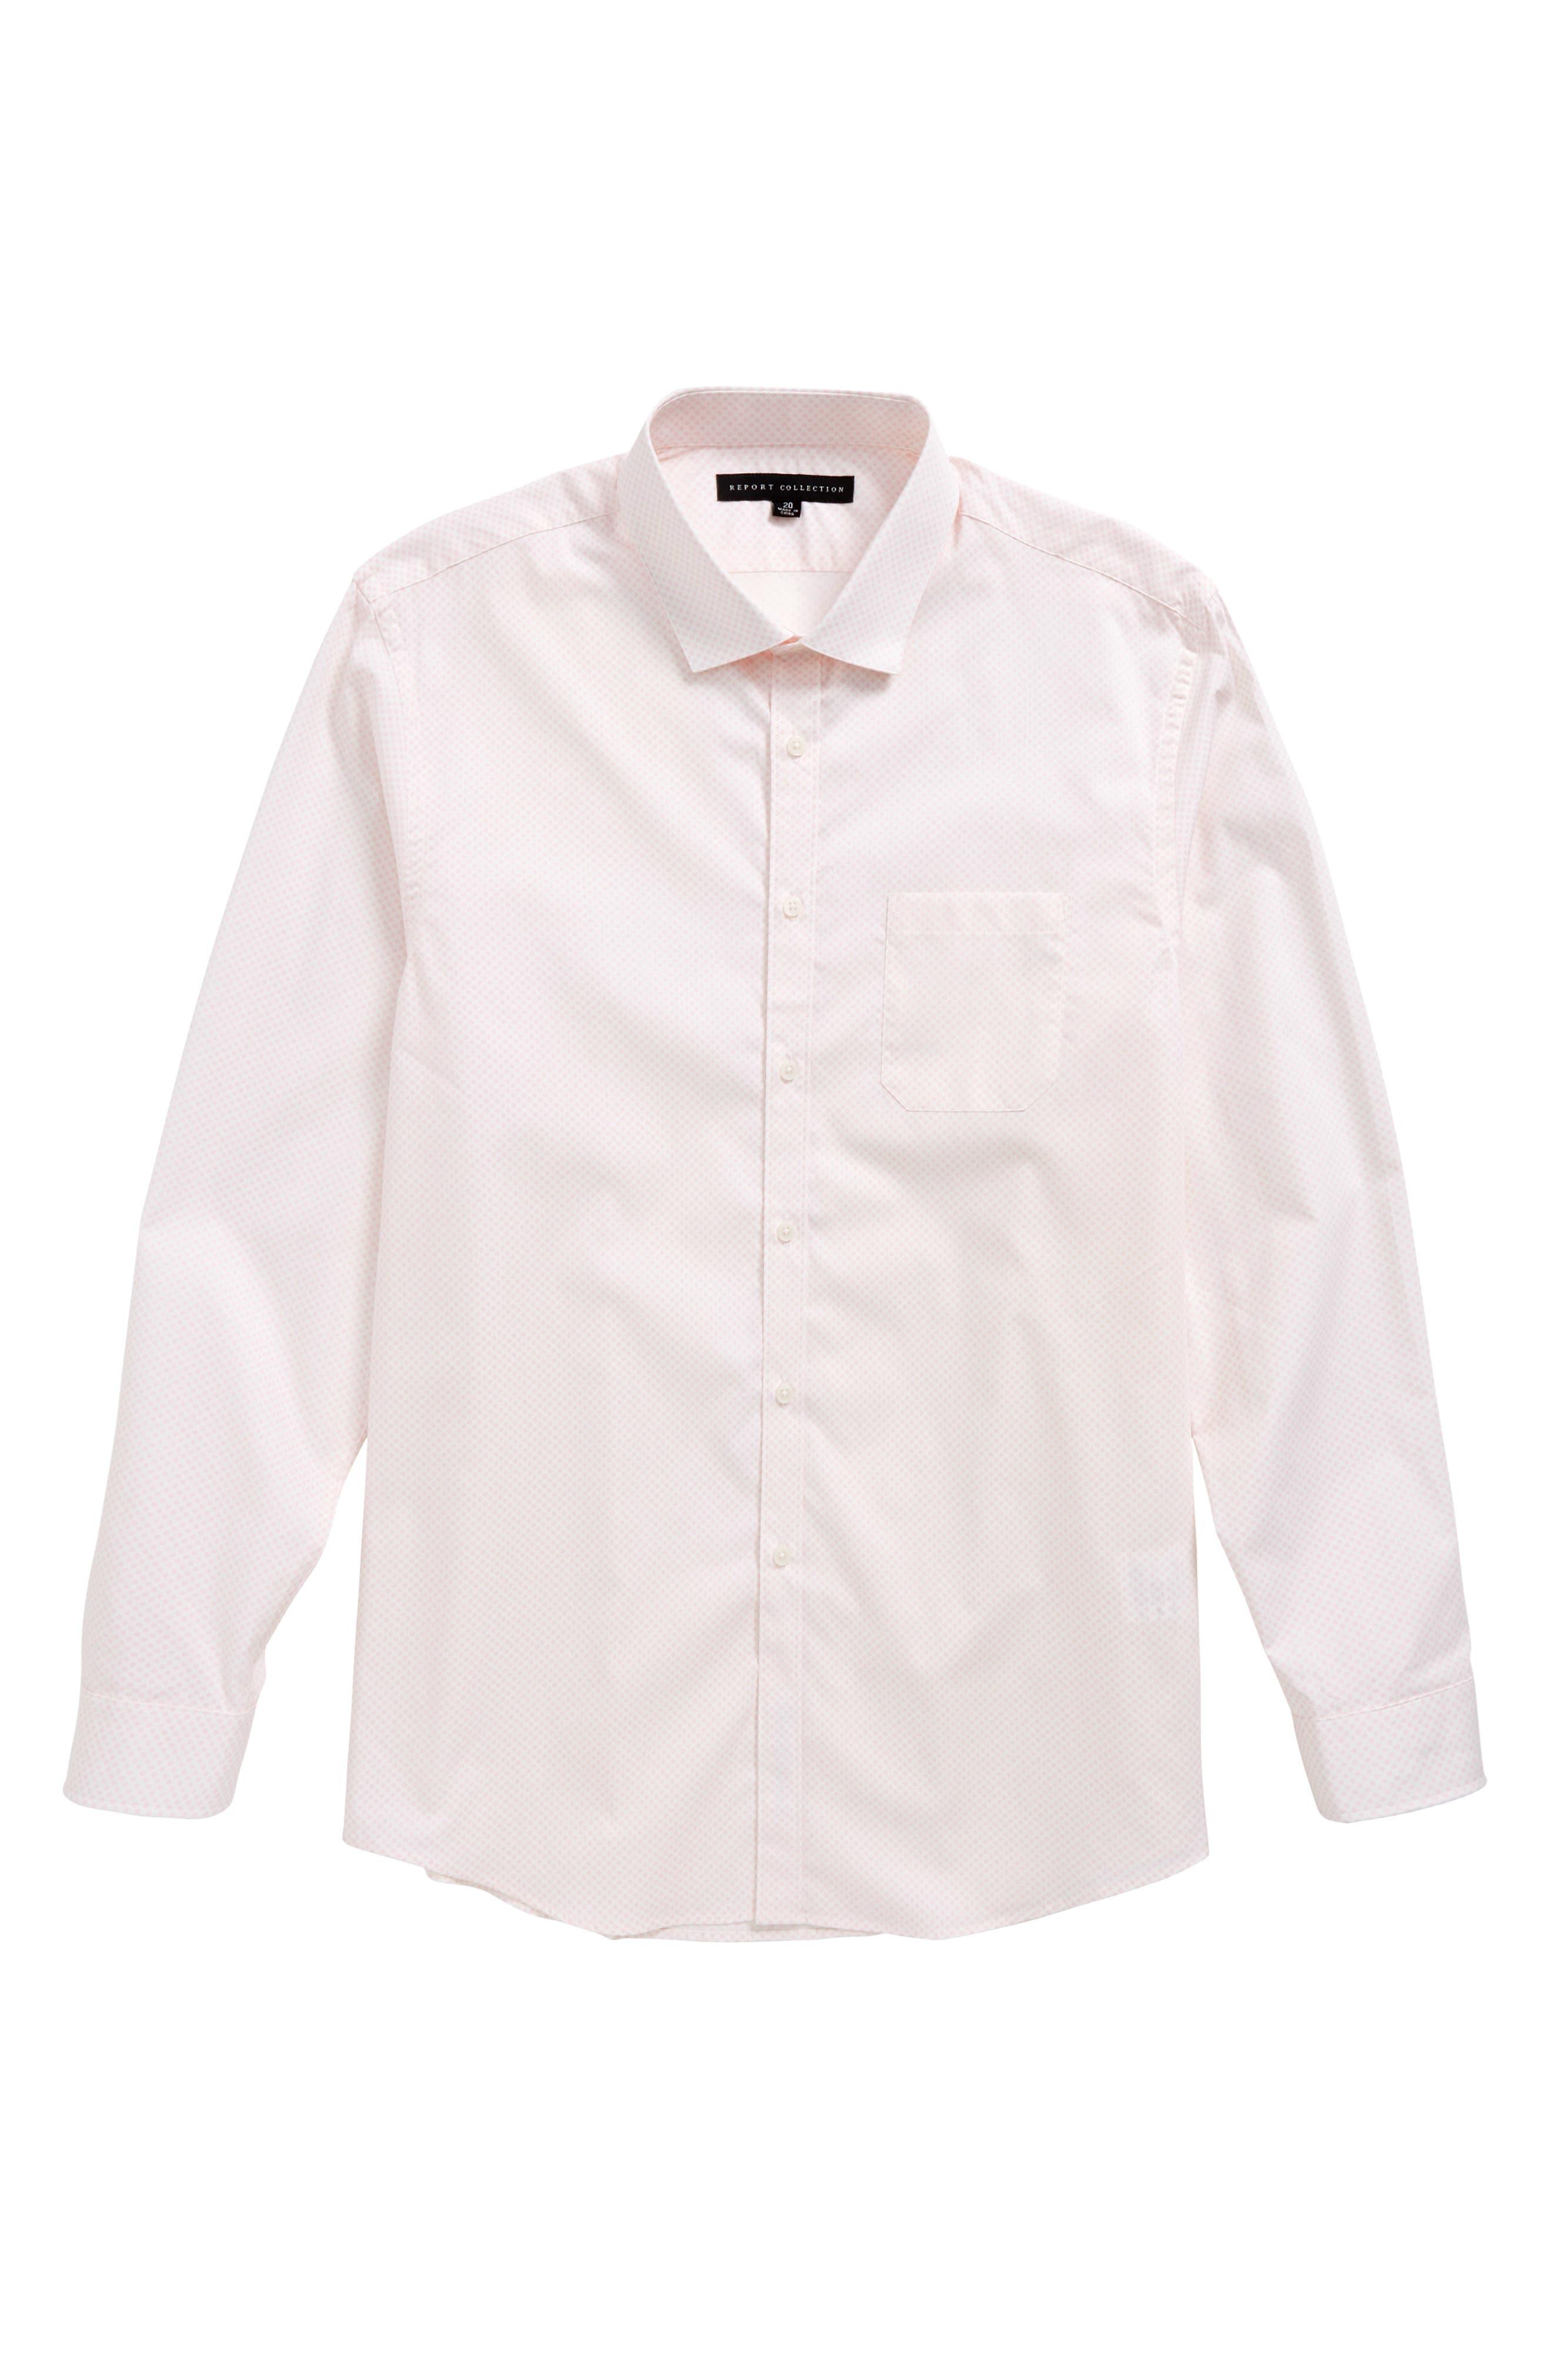 Dot Print Dress Shirt,                             Main thumbnail 1, color,                             Pink